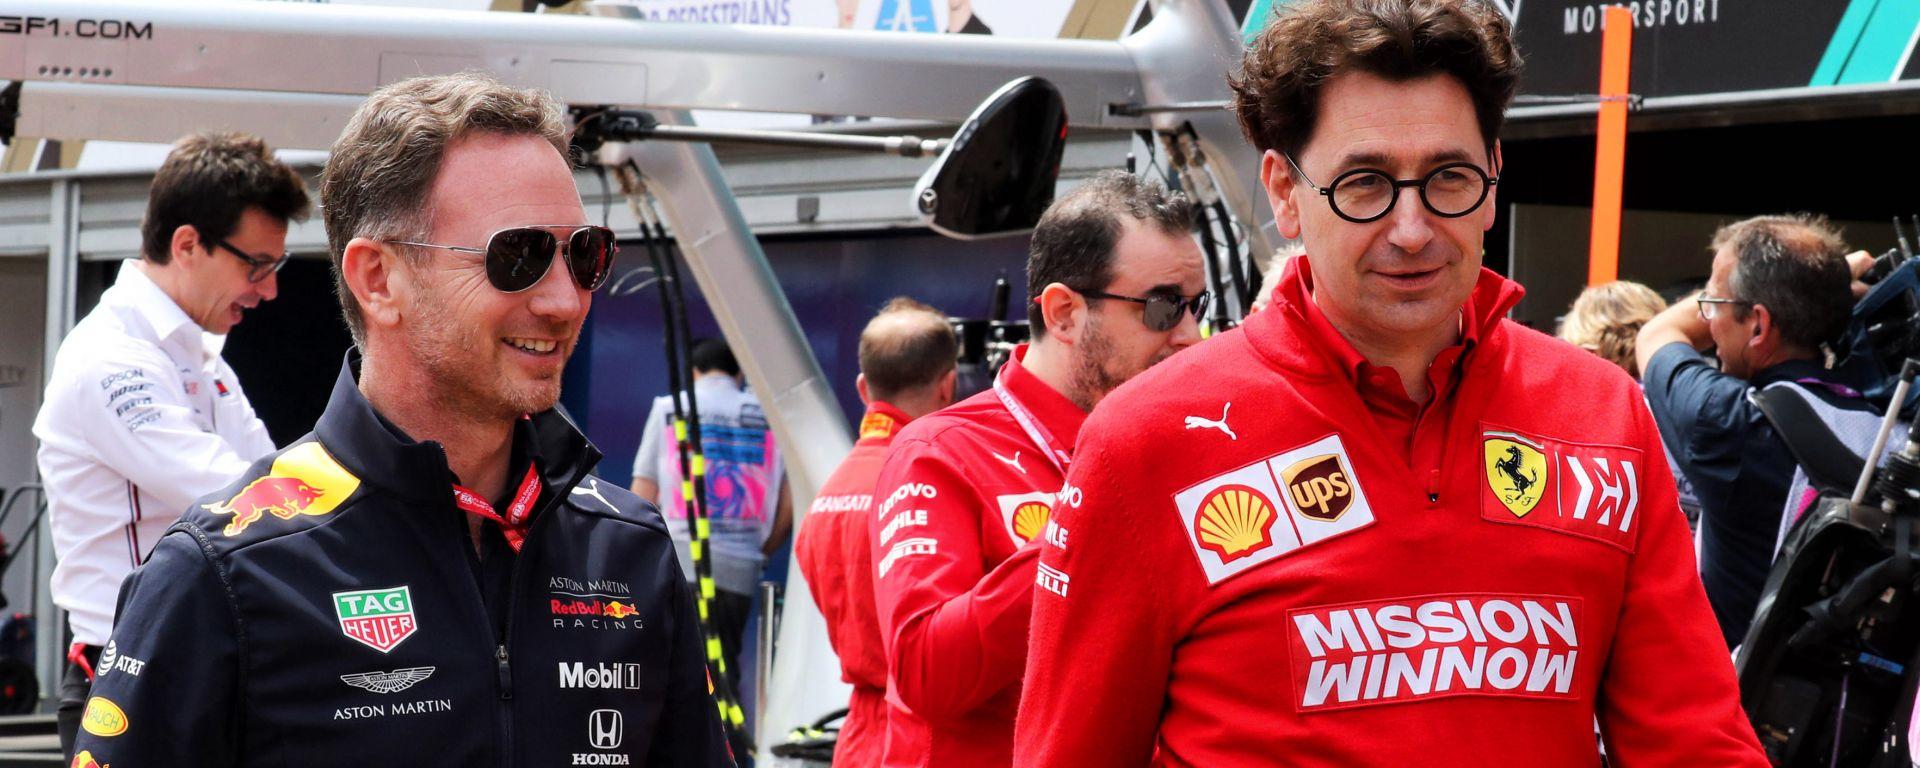 F1: i team principal Chris Horner (Red Bull) e Mattia Binotto (Ferrari)